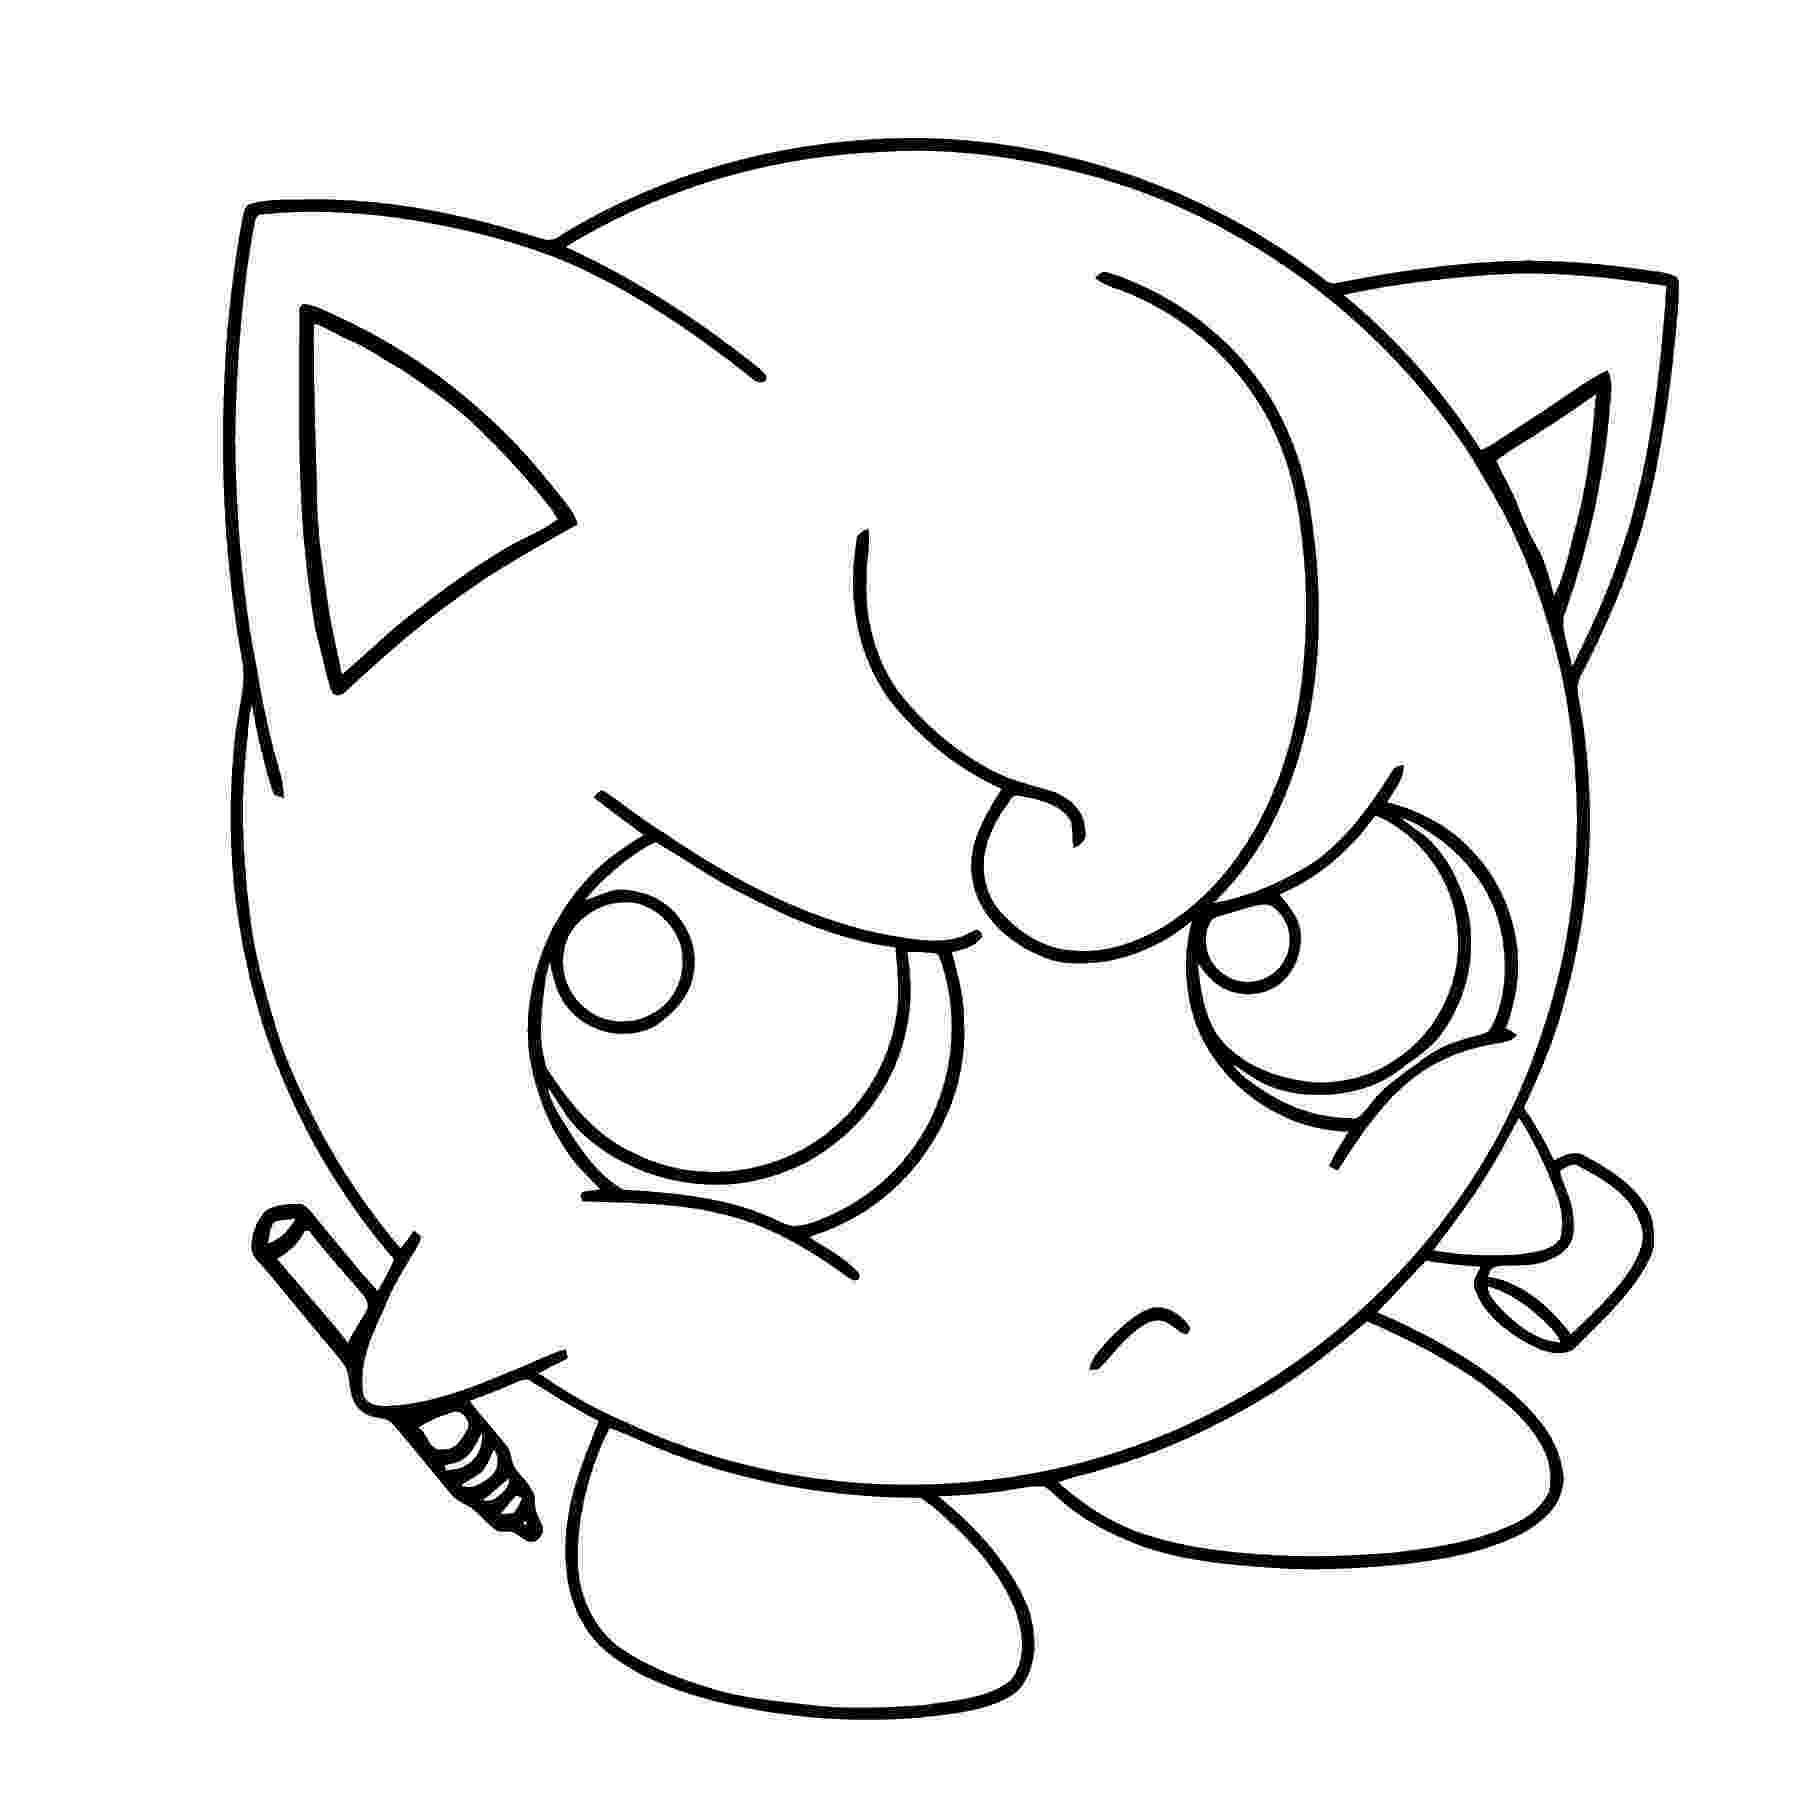 jigglypuff coloring pages jigglypuff coloring pages getcoloringpagescom jigglypuff coloring pages